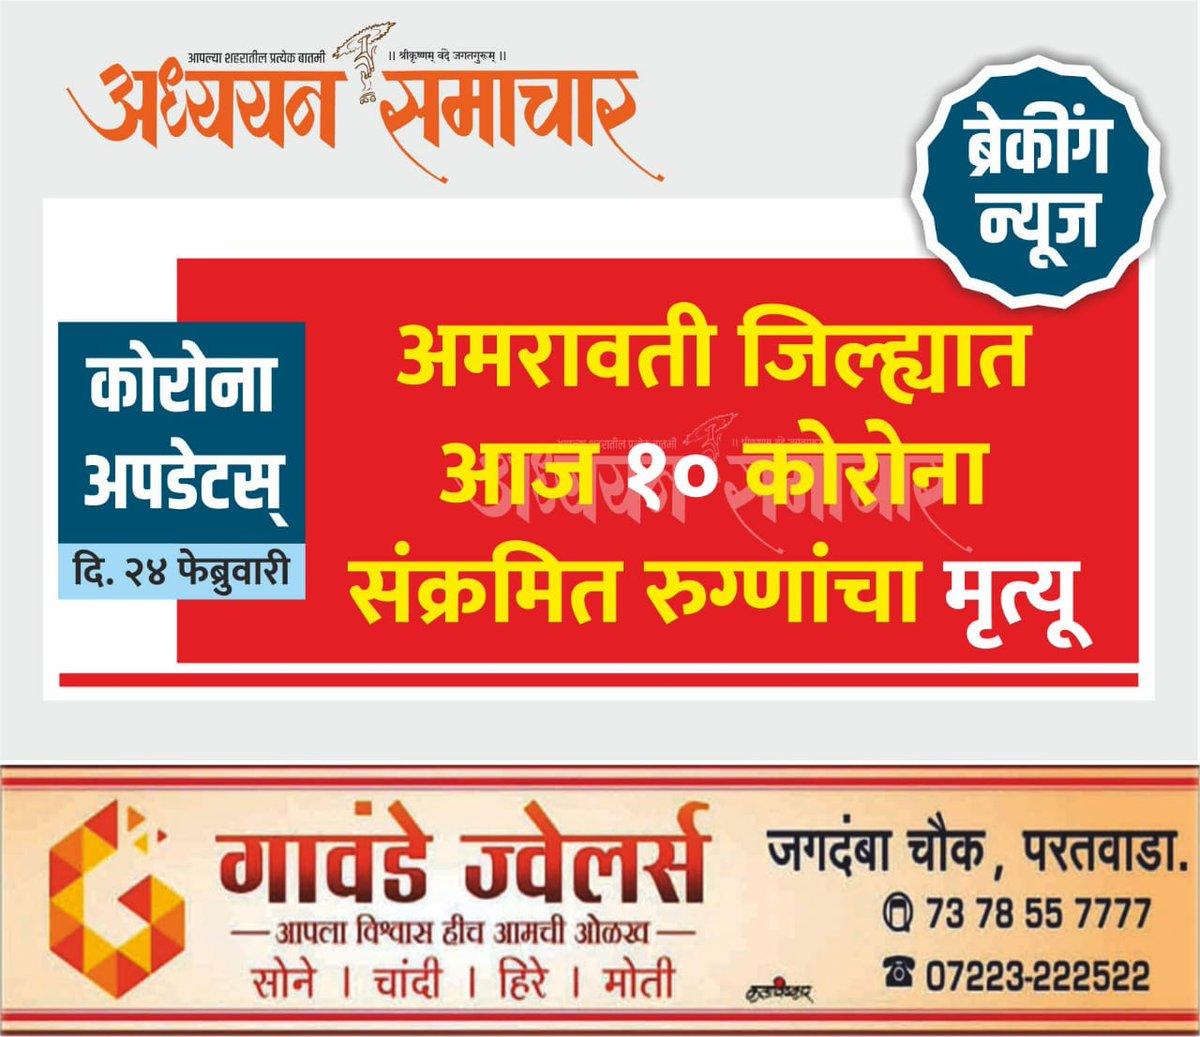 @VishnuNDTV At Amravati 👇👇. 10 death due to COVID19. https://t.co/IGLI1Hr8j4